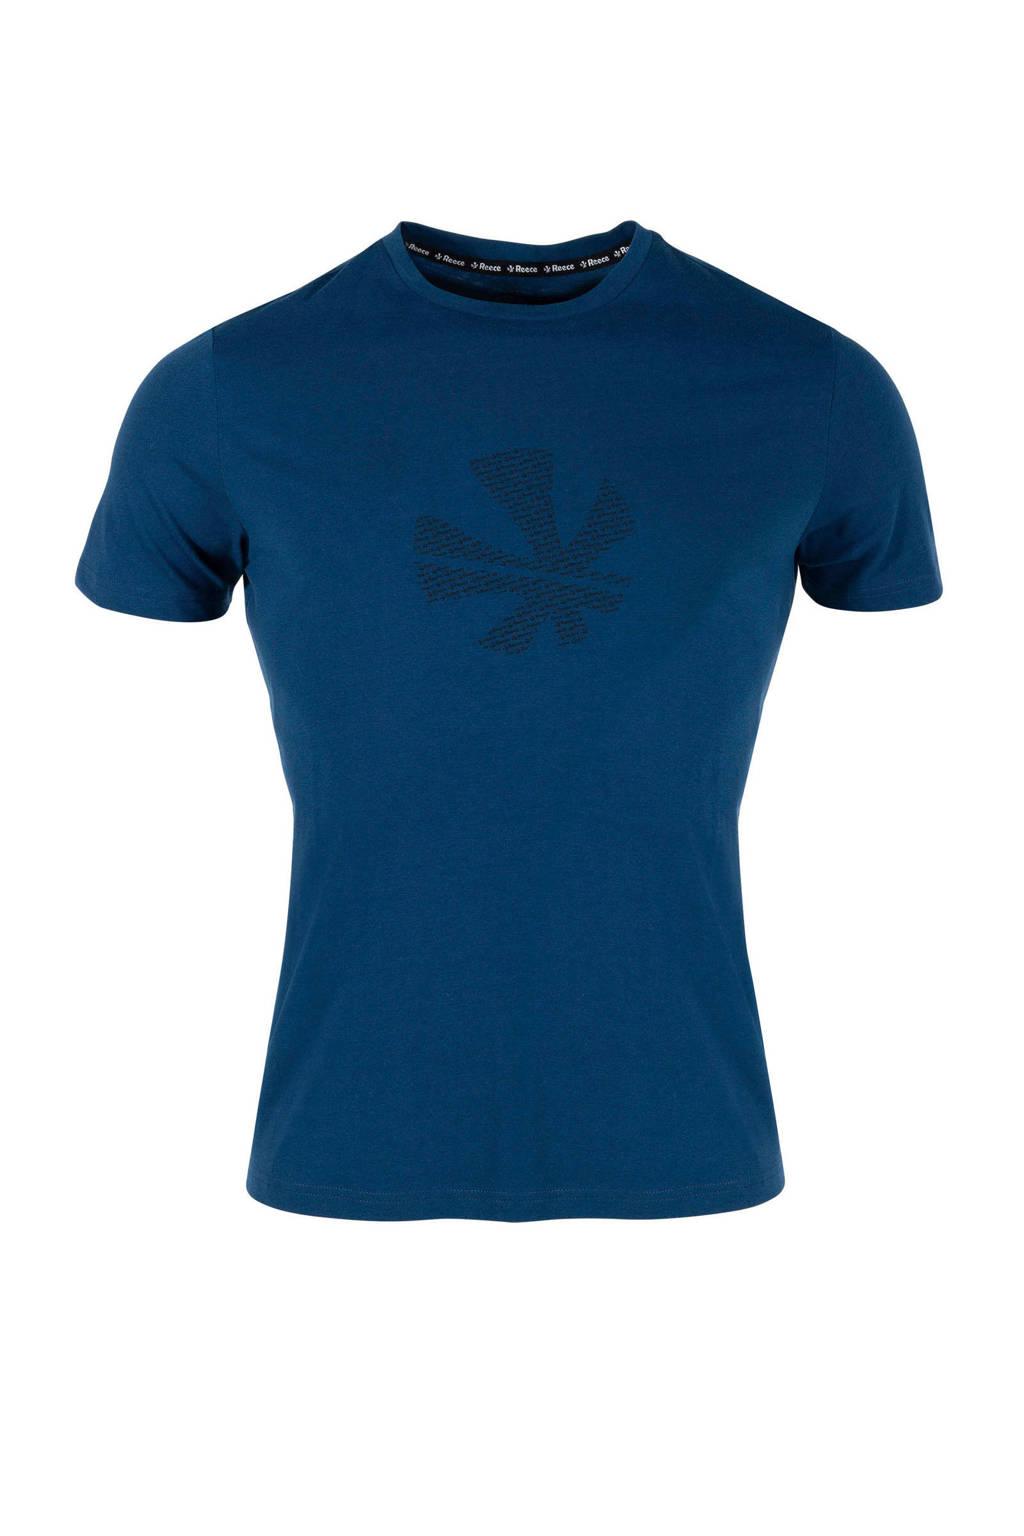 Reece Australia   sport T-shirt donkerblauw, Donkerblauw